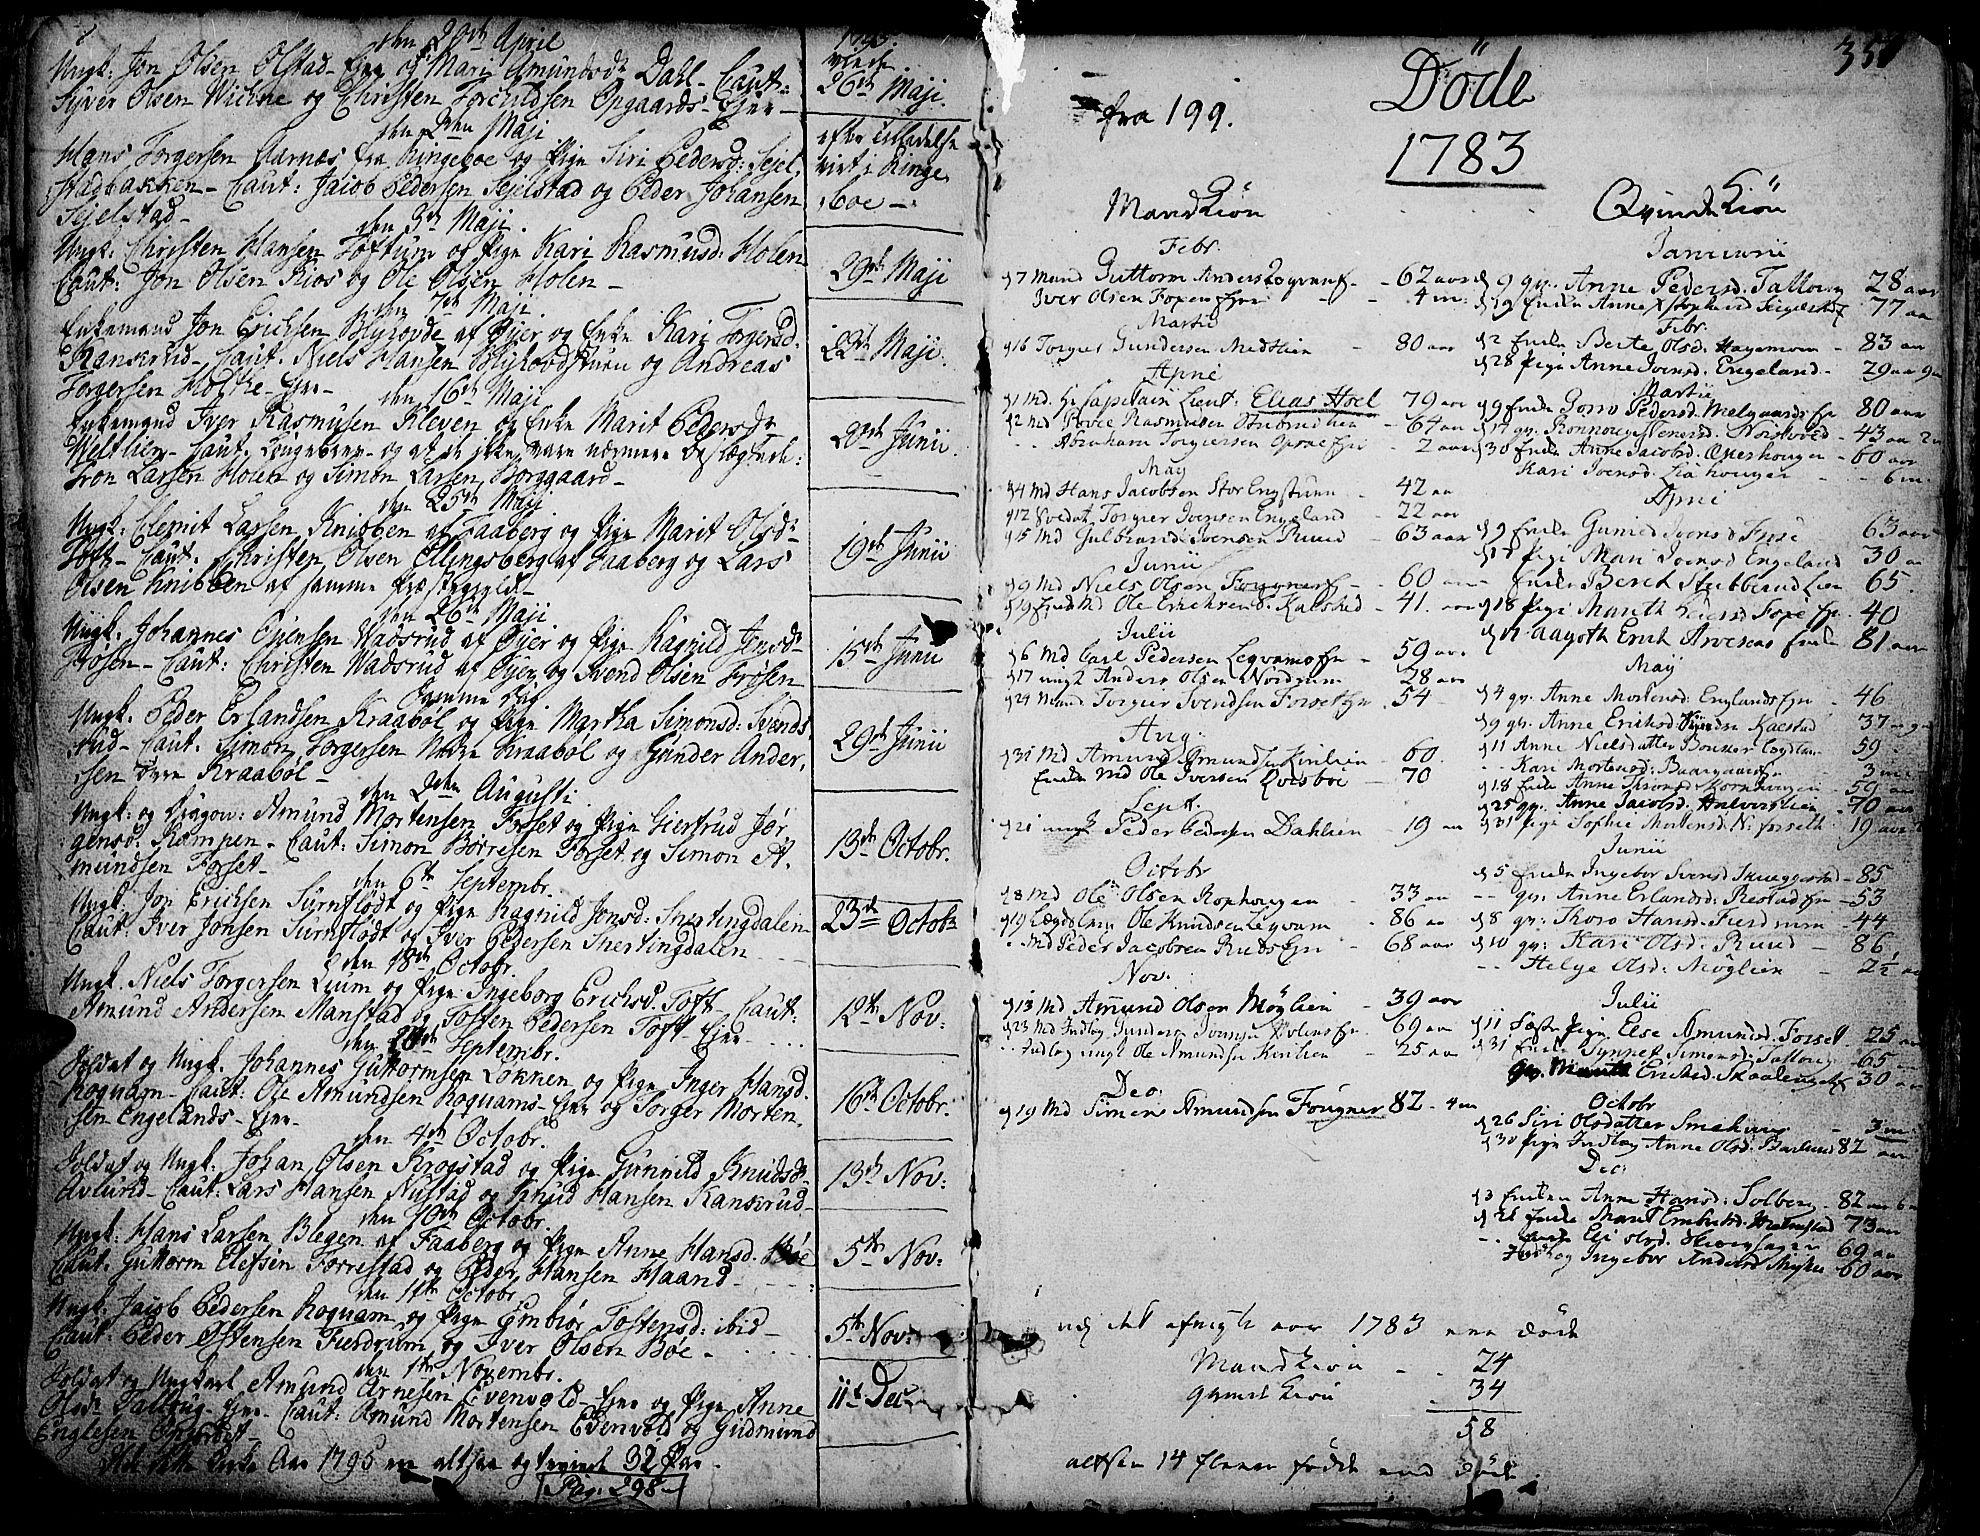 SAH, Gausdal prestekontor, Ministerialbok nr. 3, 1758-1809, s. 351